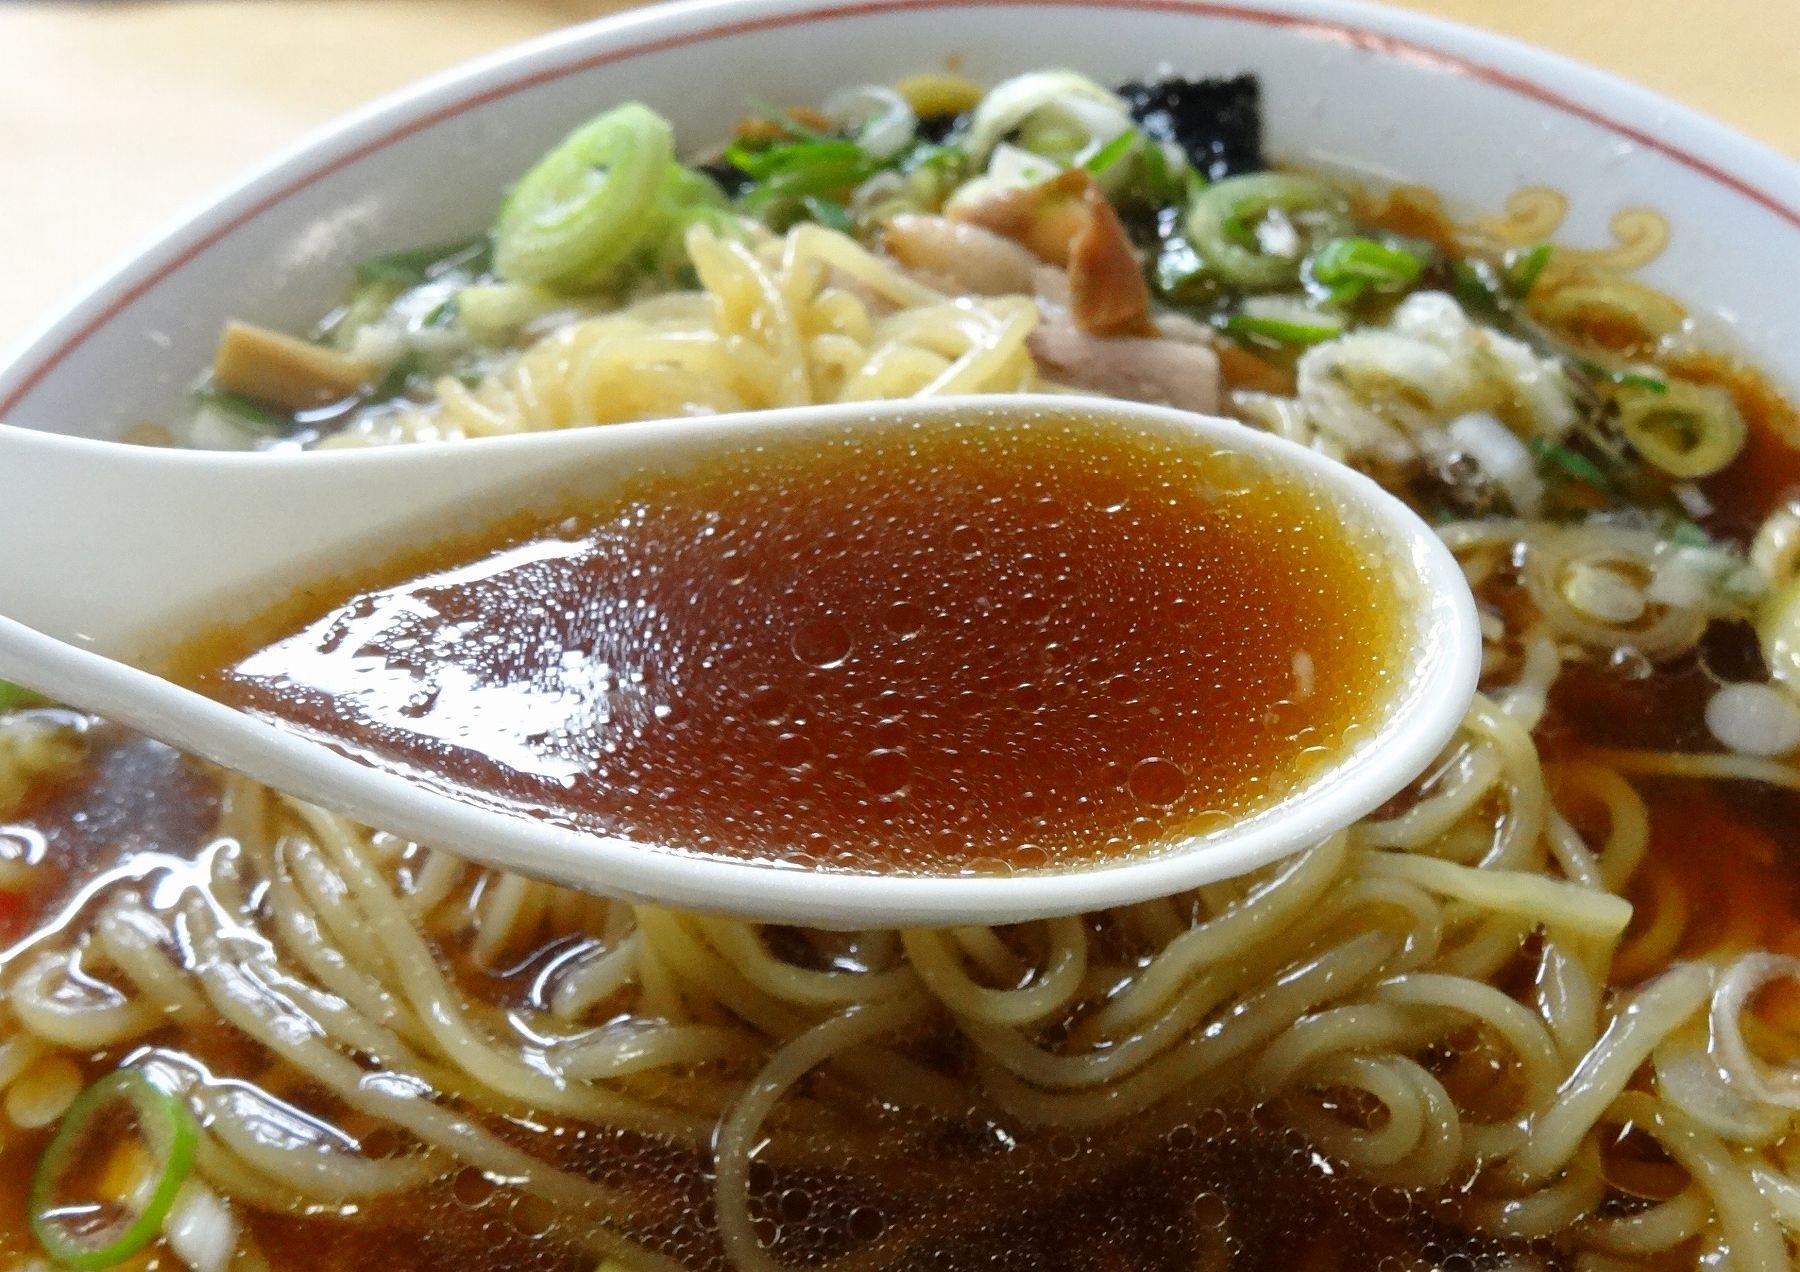 20121102005aoshima.jpg